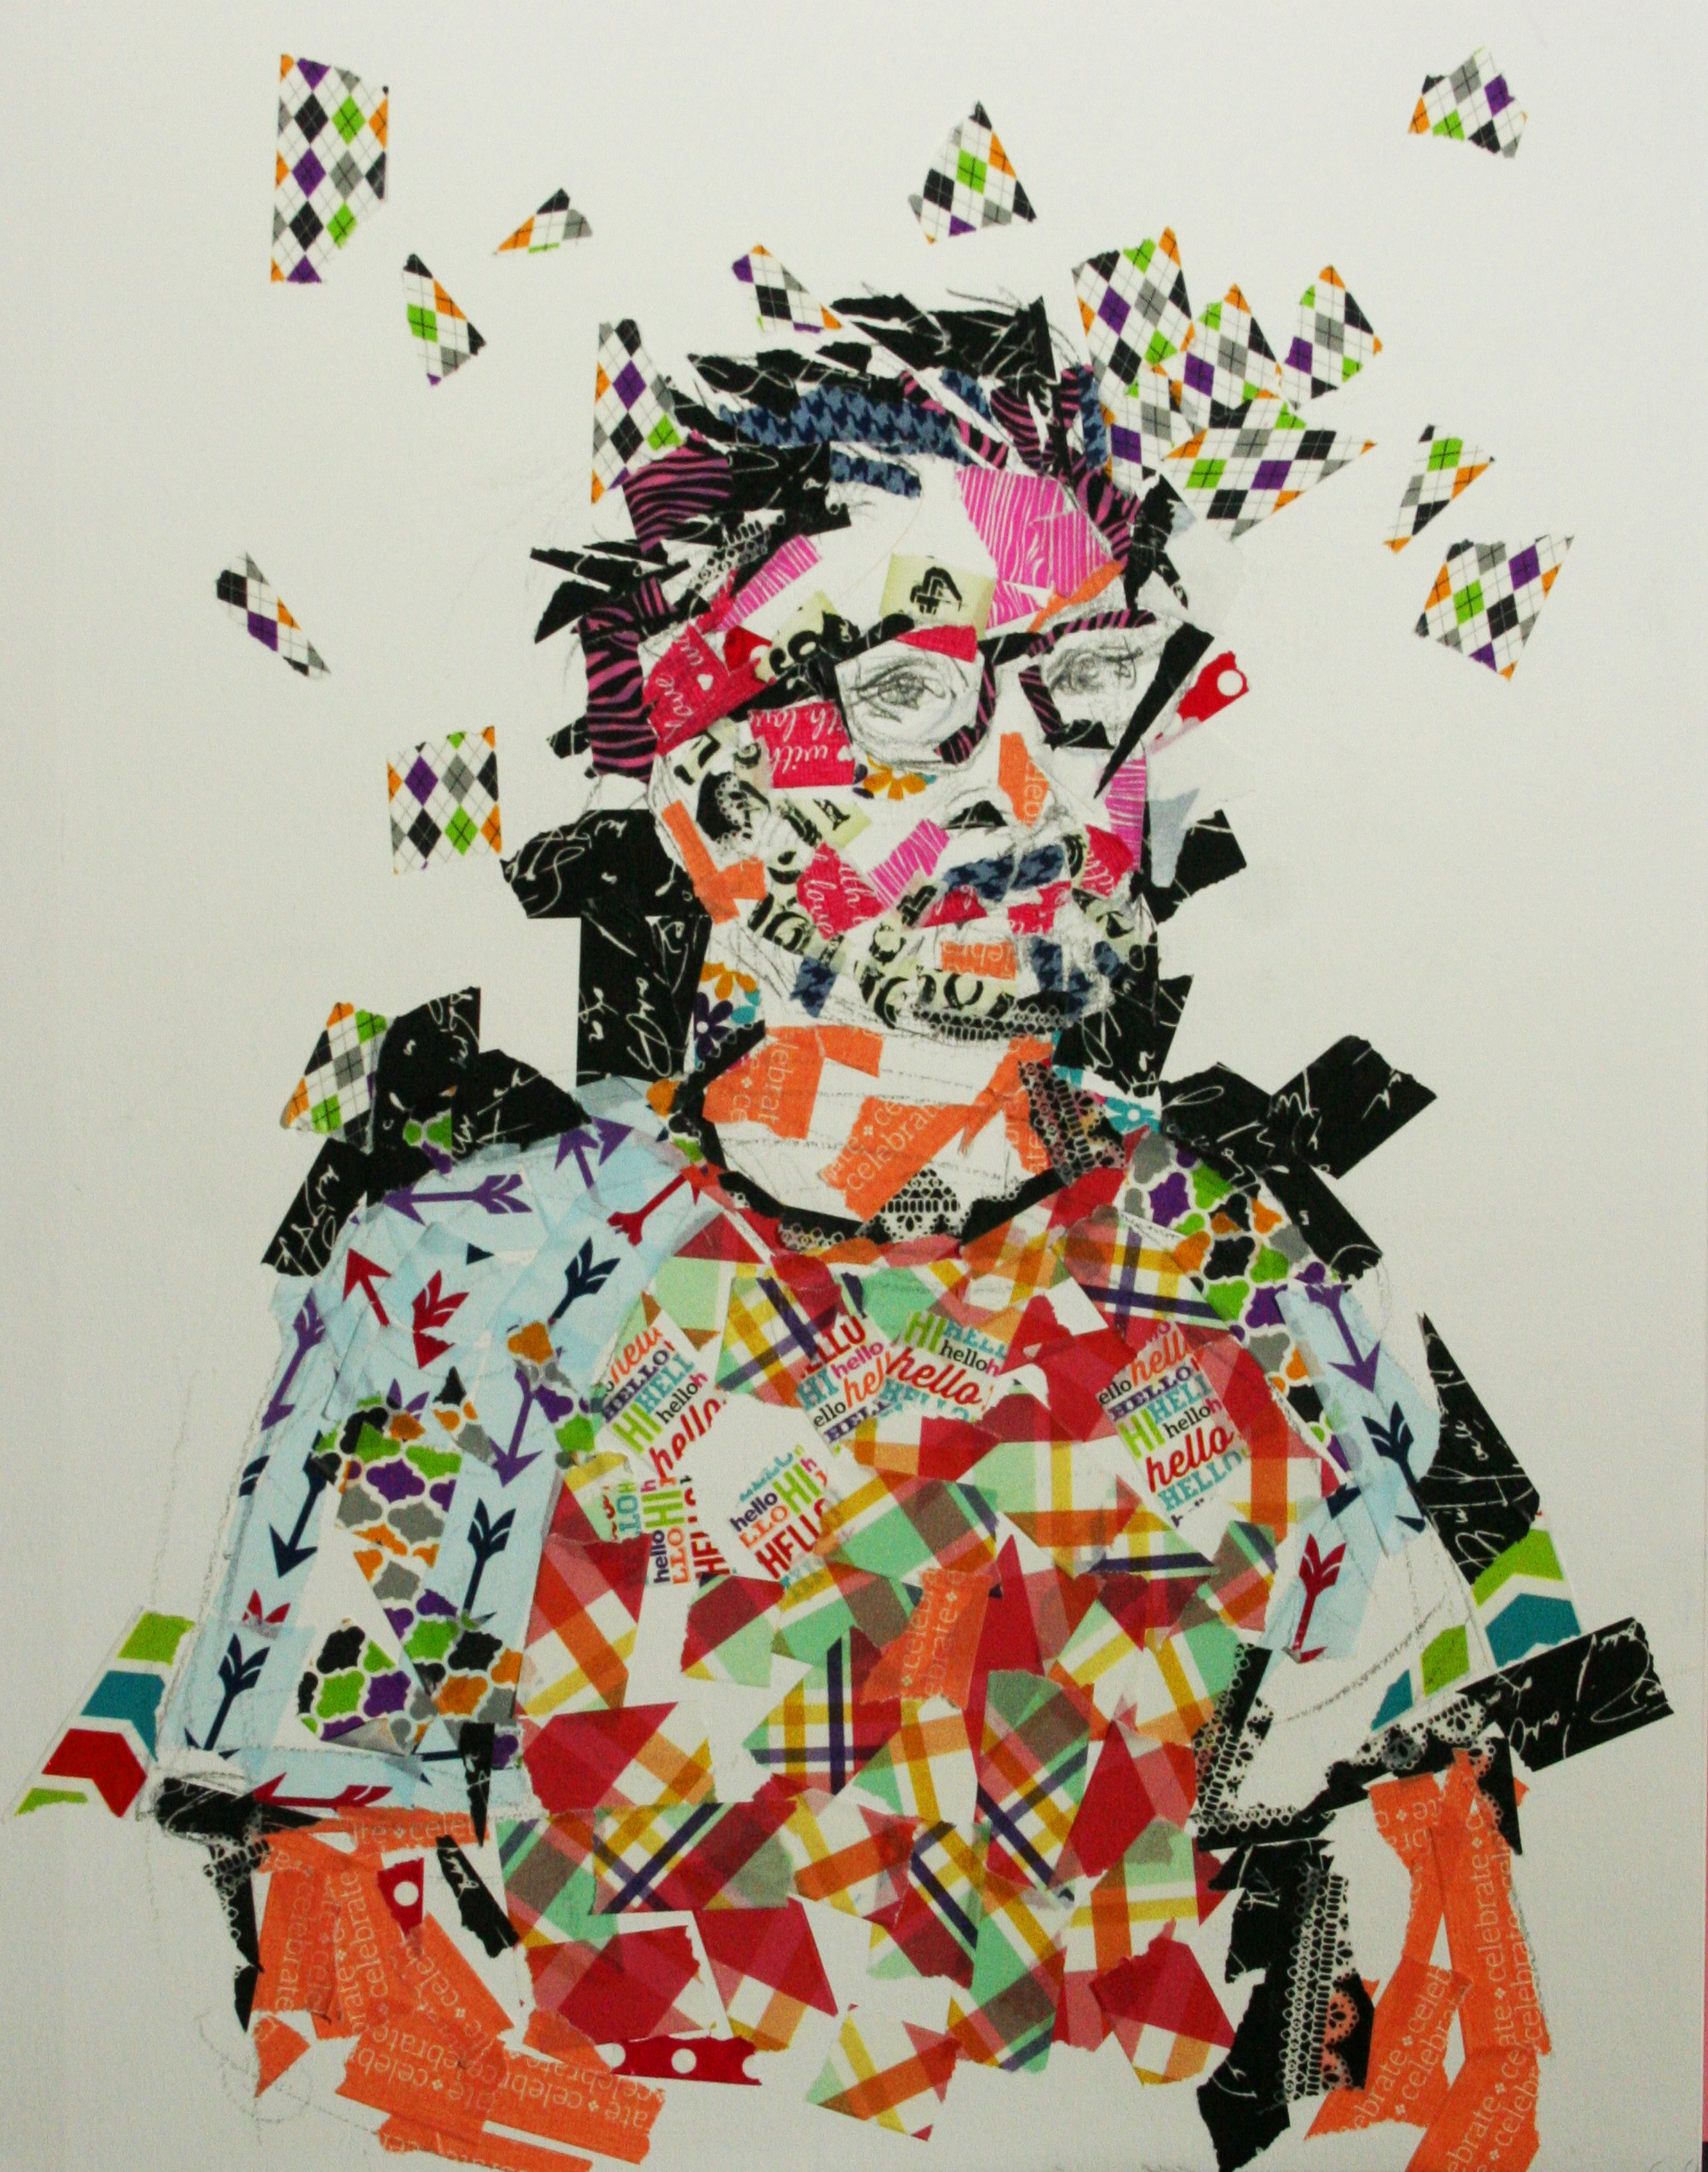 Aleksandra Vandenhove created this hour and a half sticker portrait